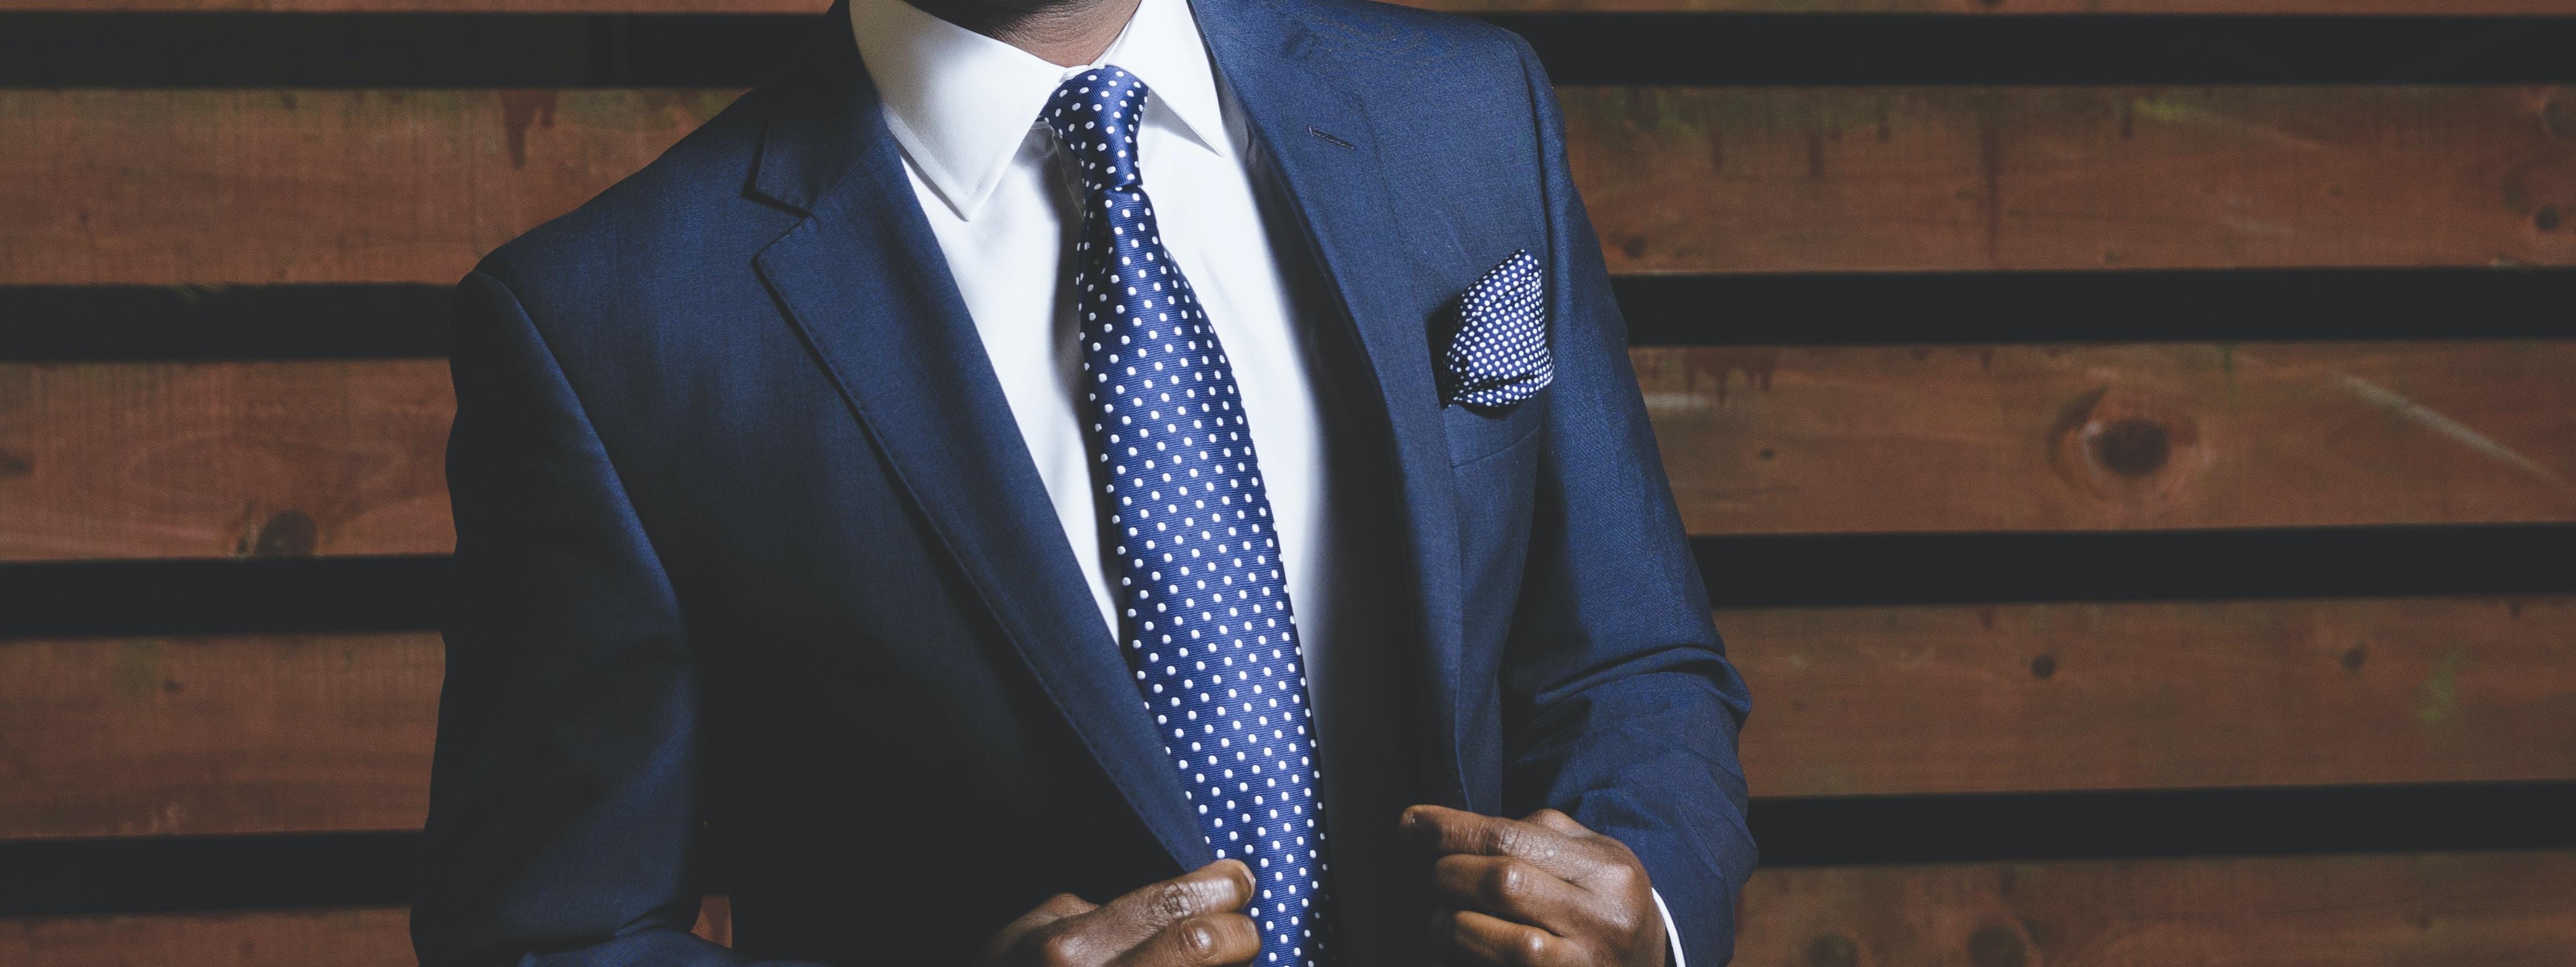 man wearing blue suit